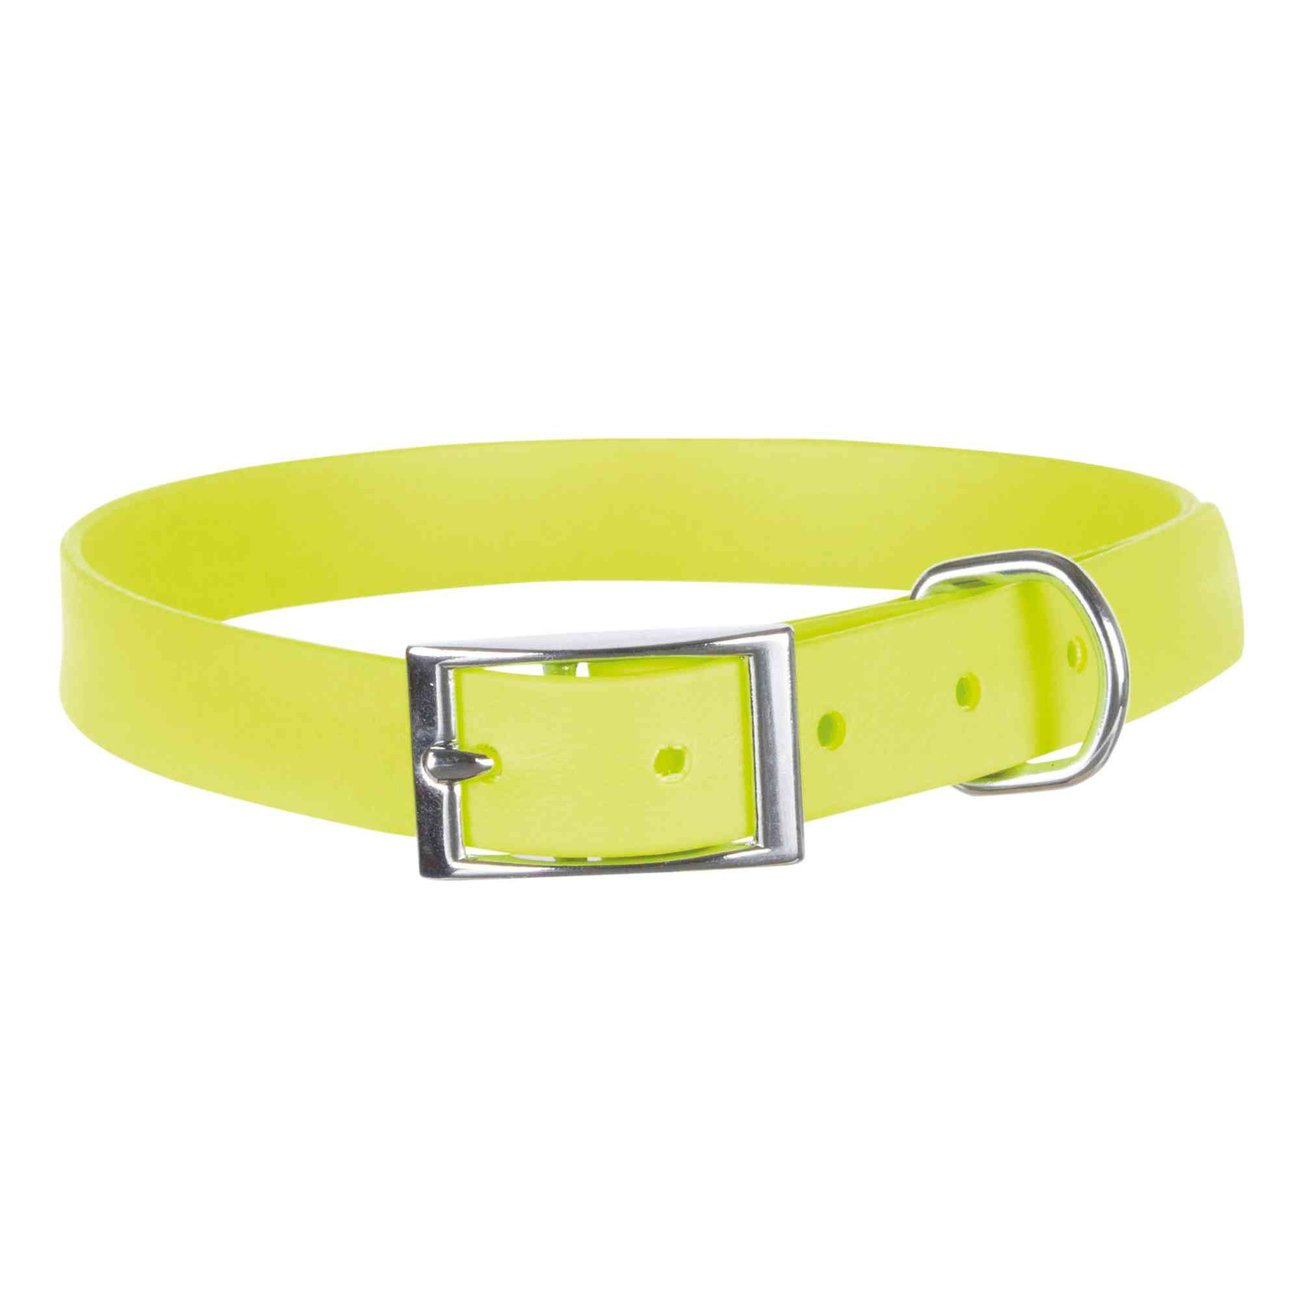 TRIXIE Easy Life Hunde Halsband PVC Mantel 20720, Bild 2